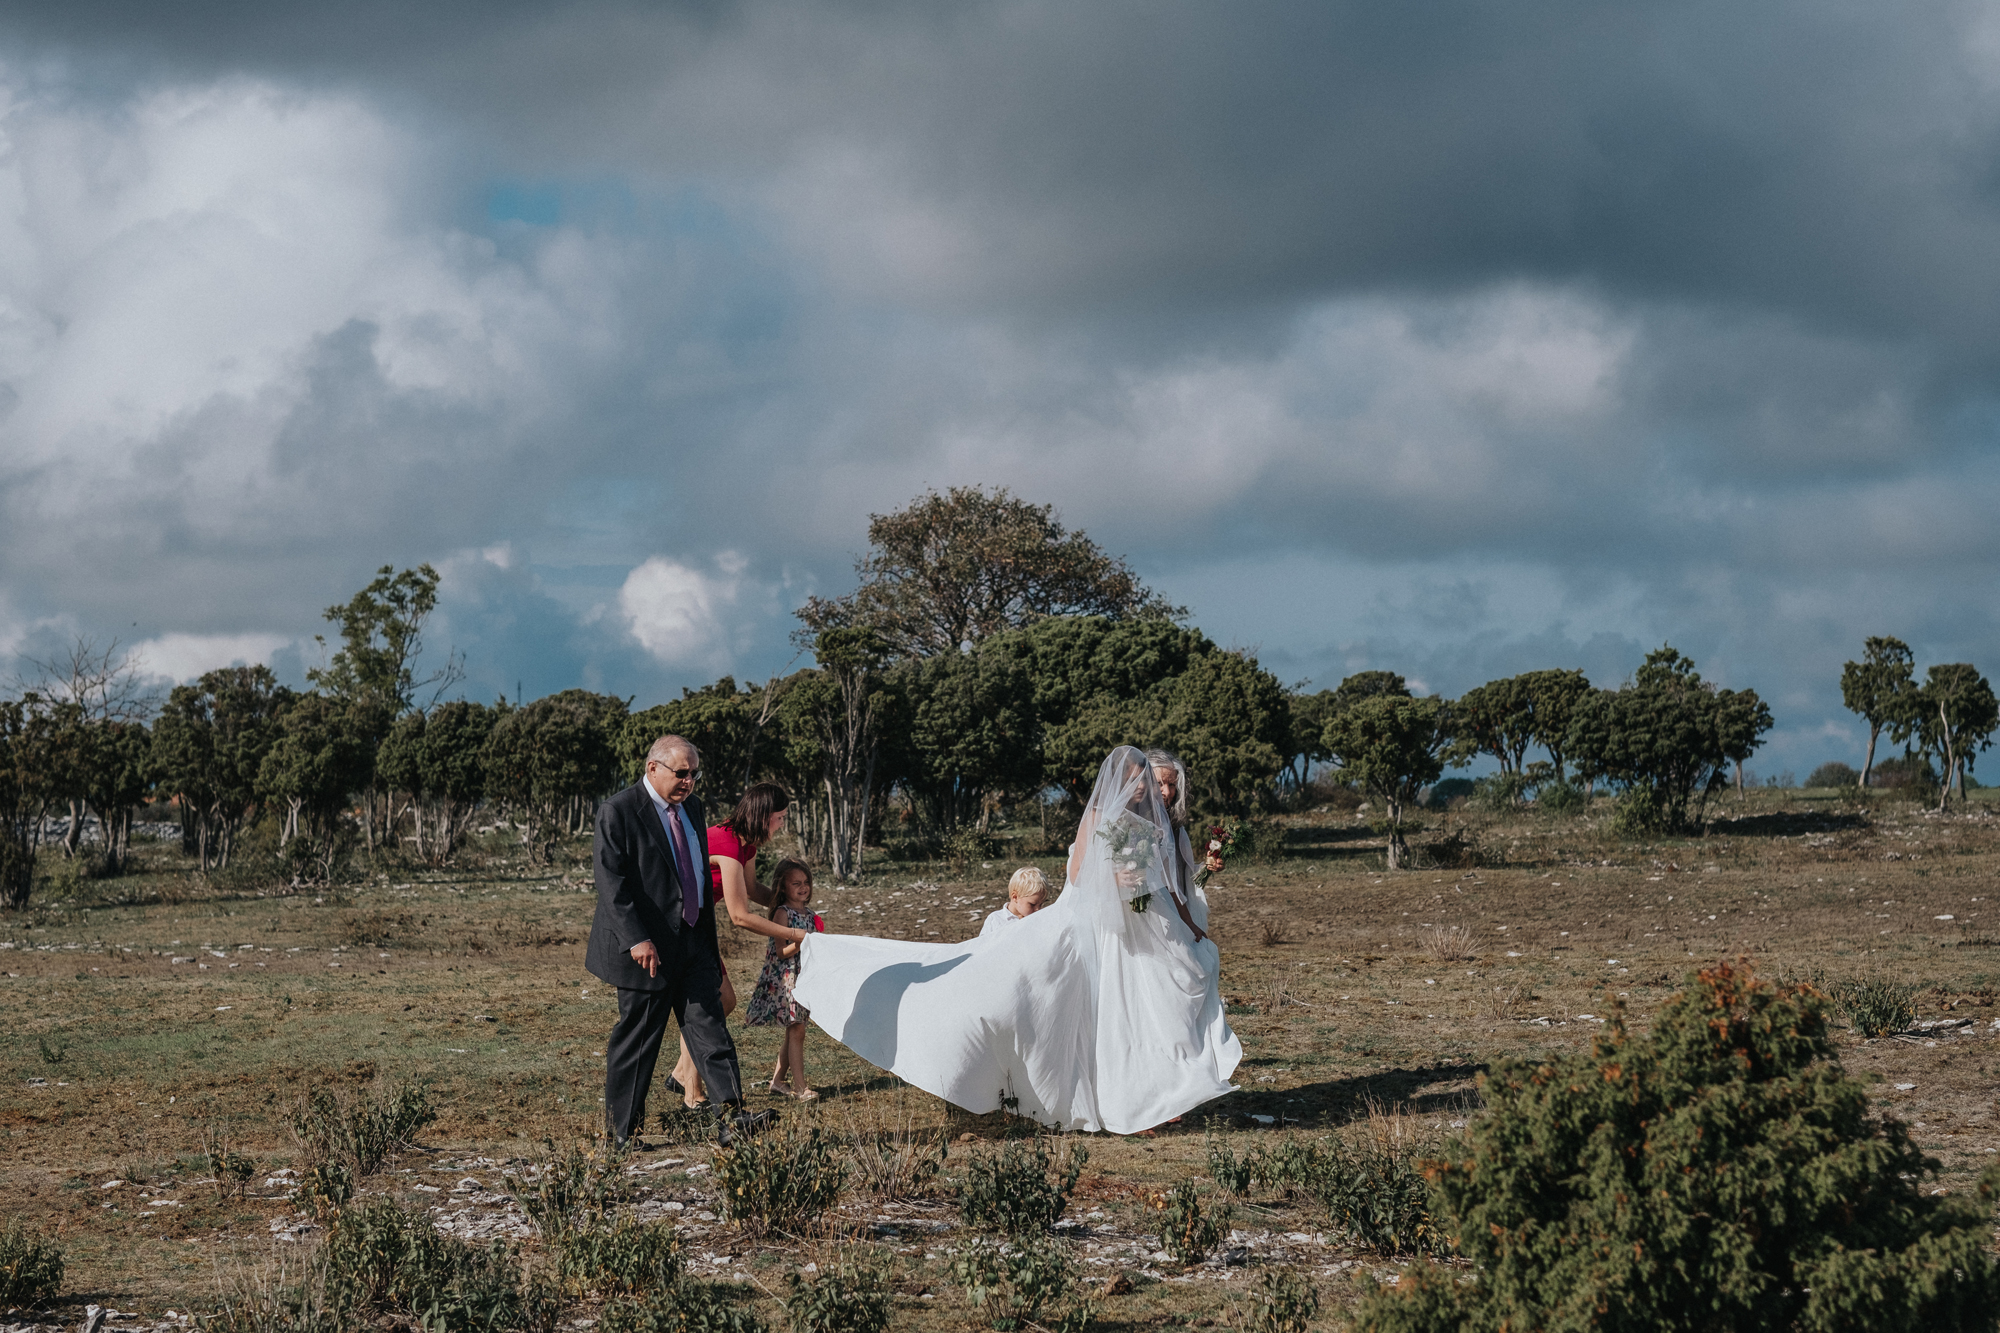 014-bröllop-stora-gåsemora-neas-fotografi.jpg